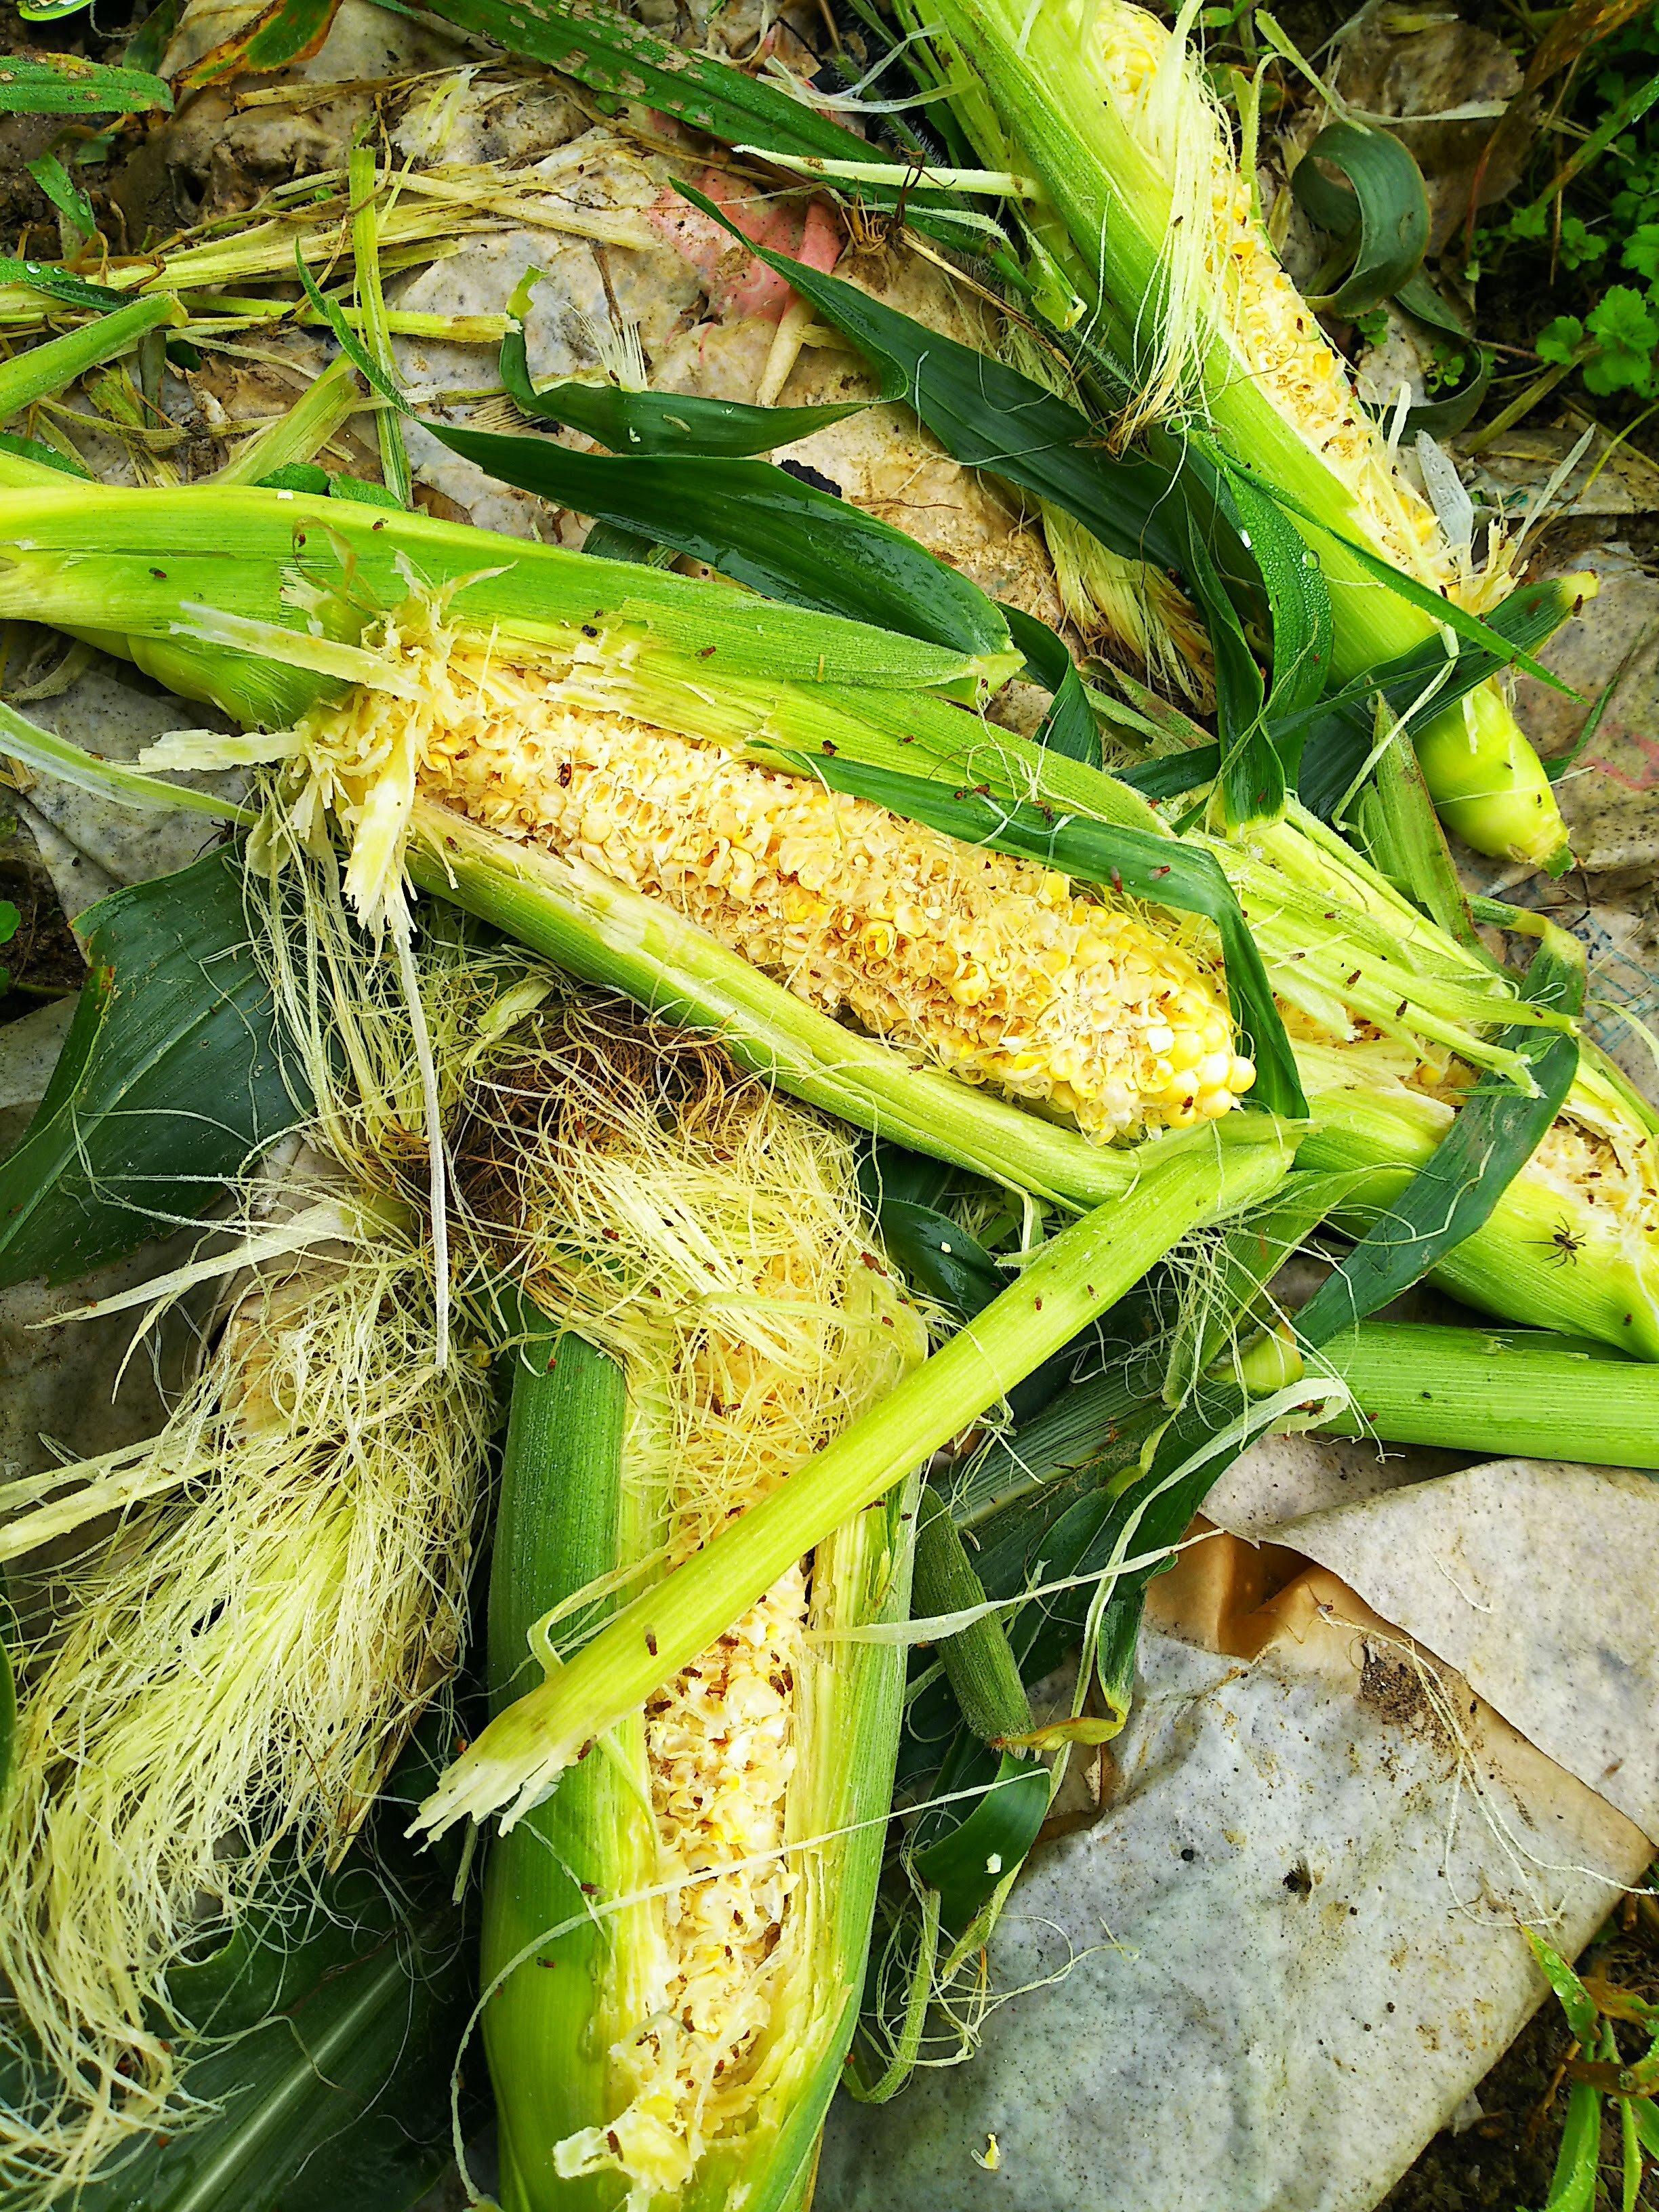 唐黍の食害 : 自然遊民